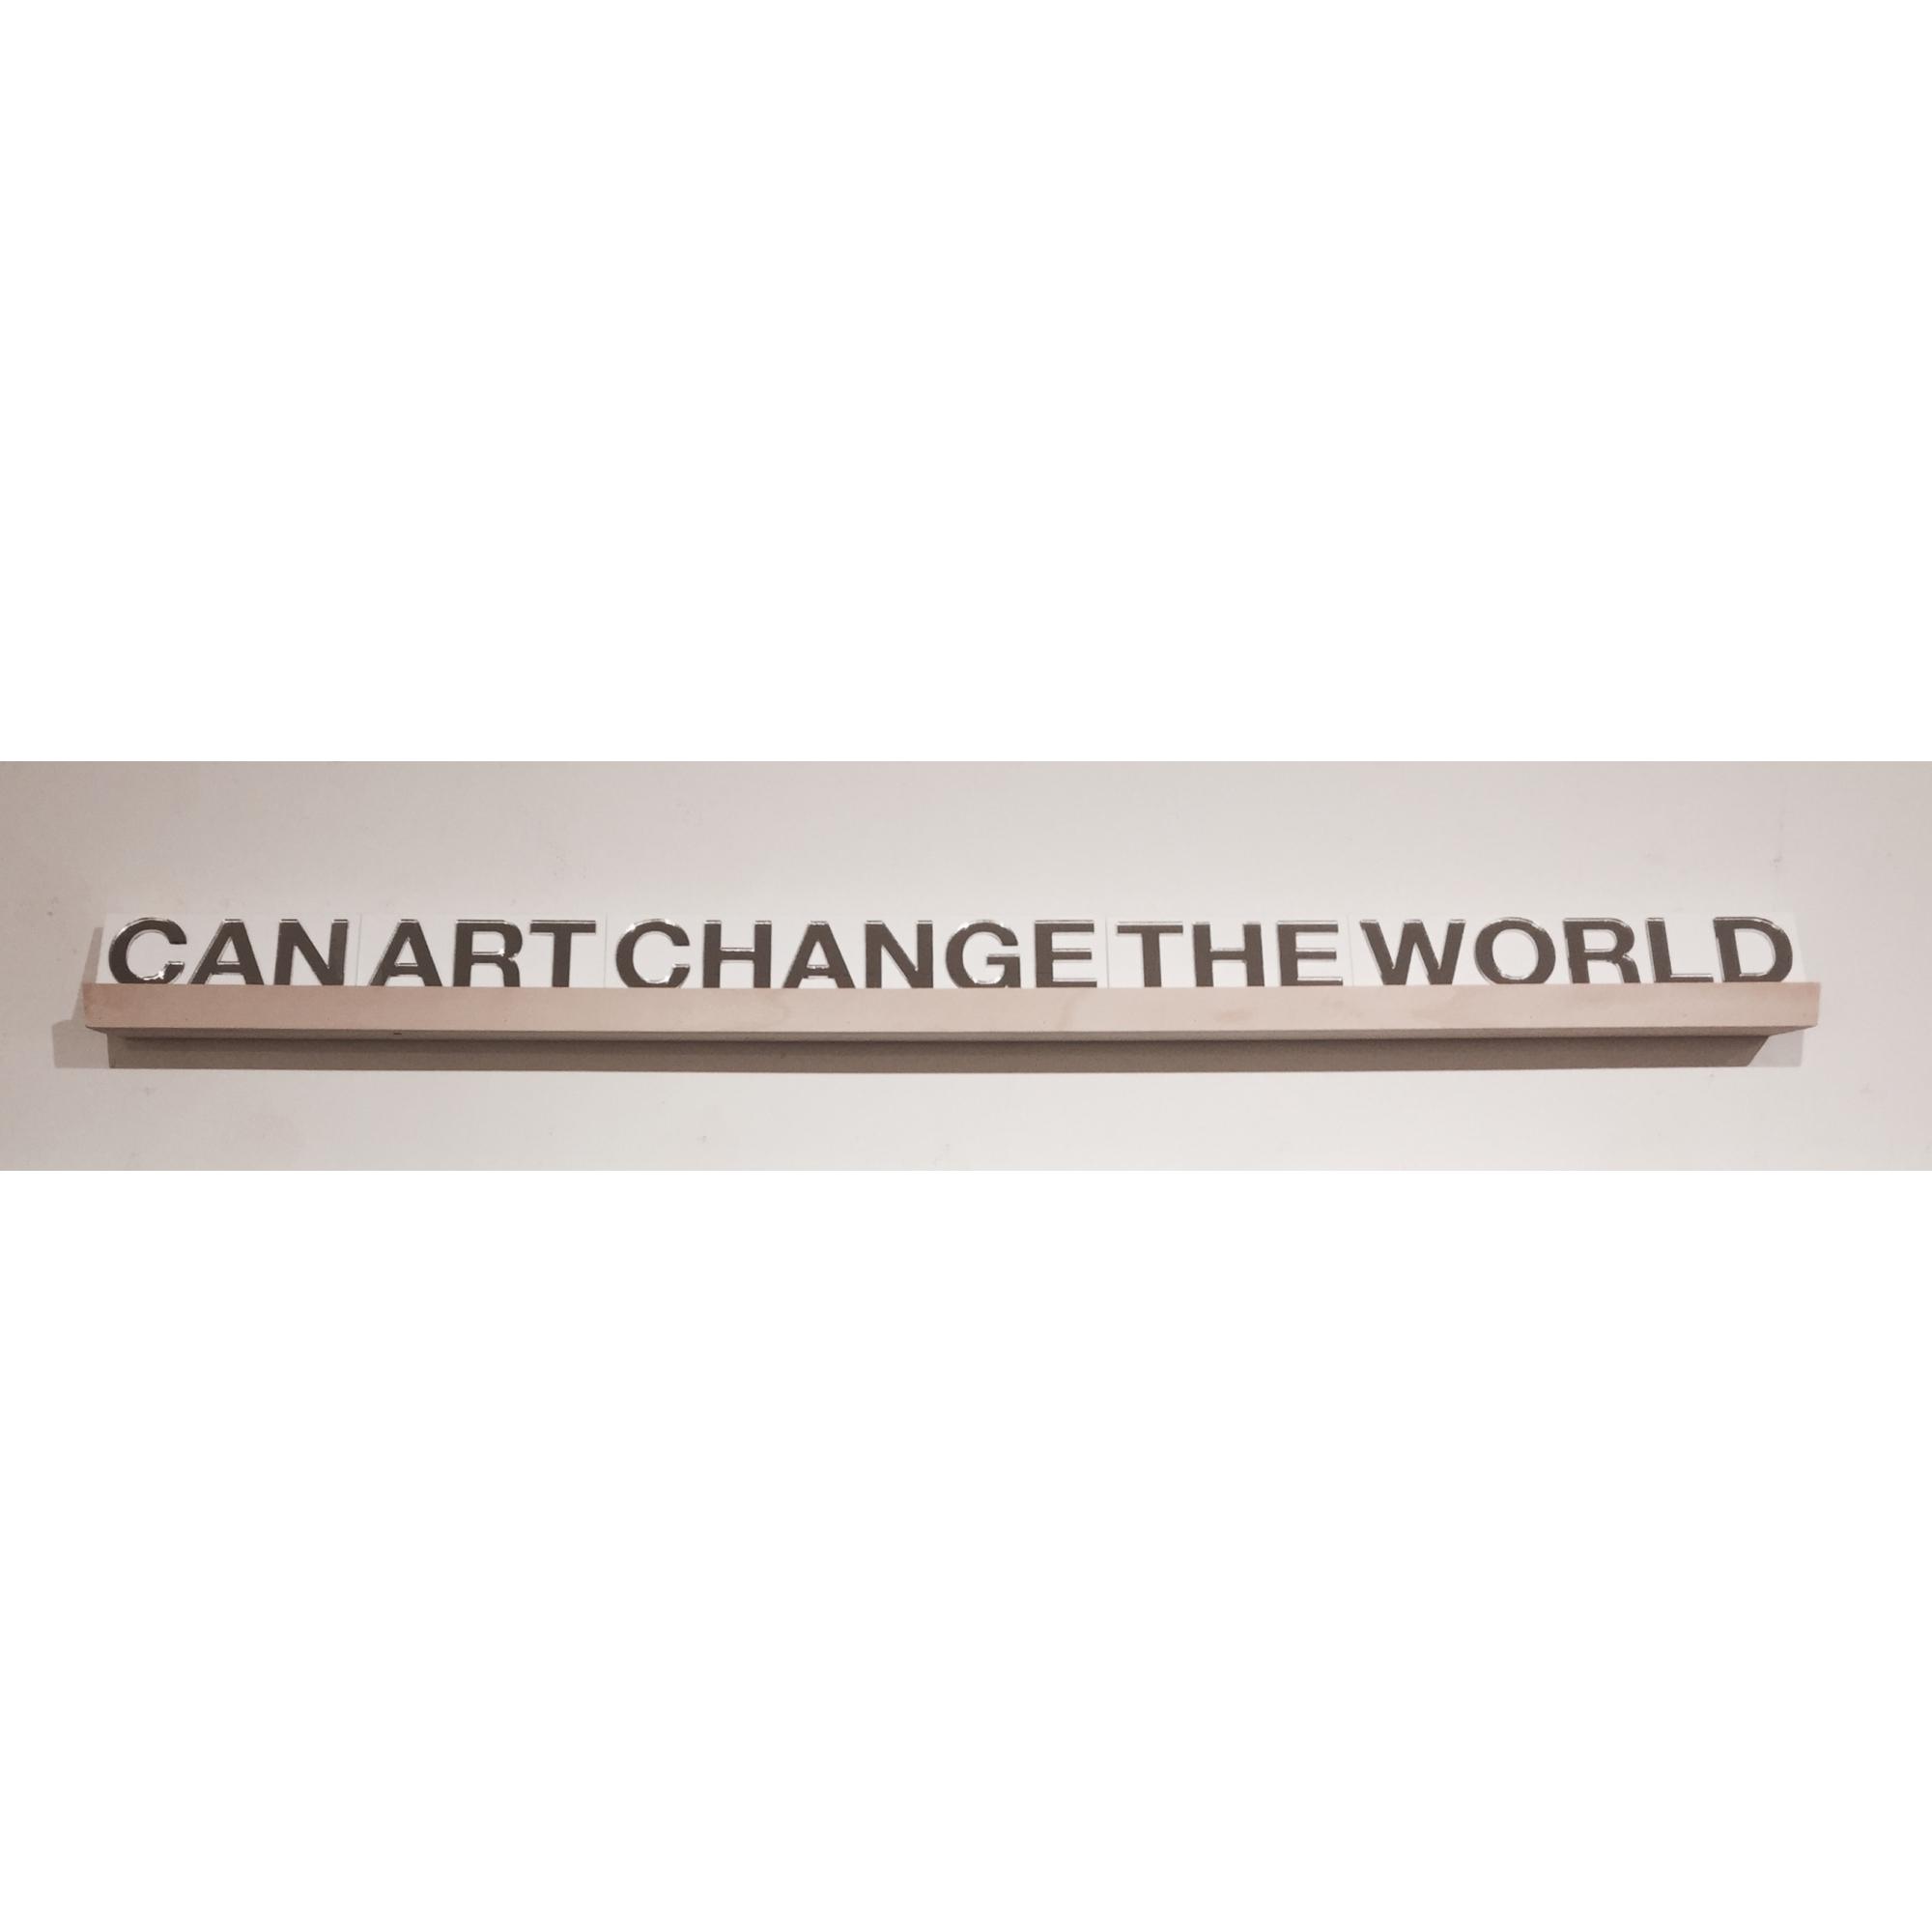 Art Can Change the World  by Tek Yang